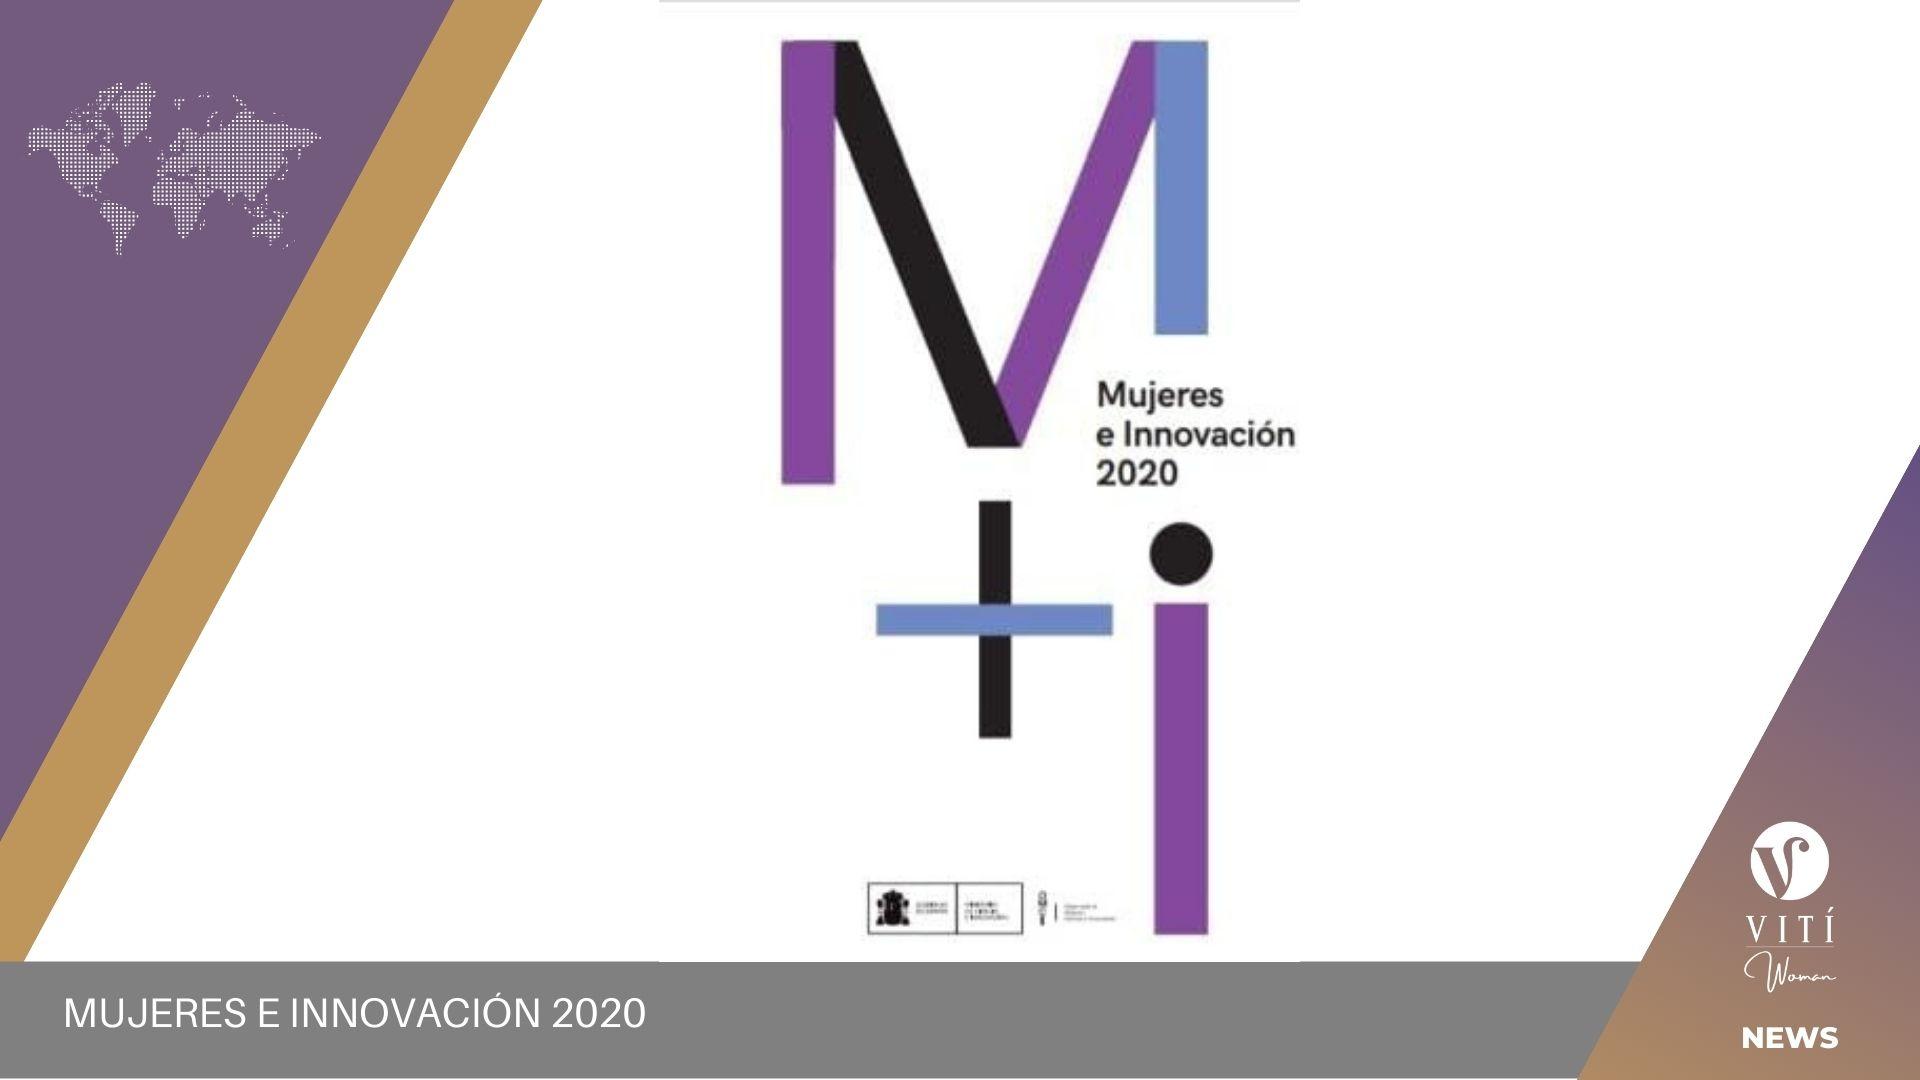 Mujeres e innovacion 2020